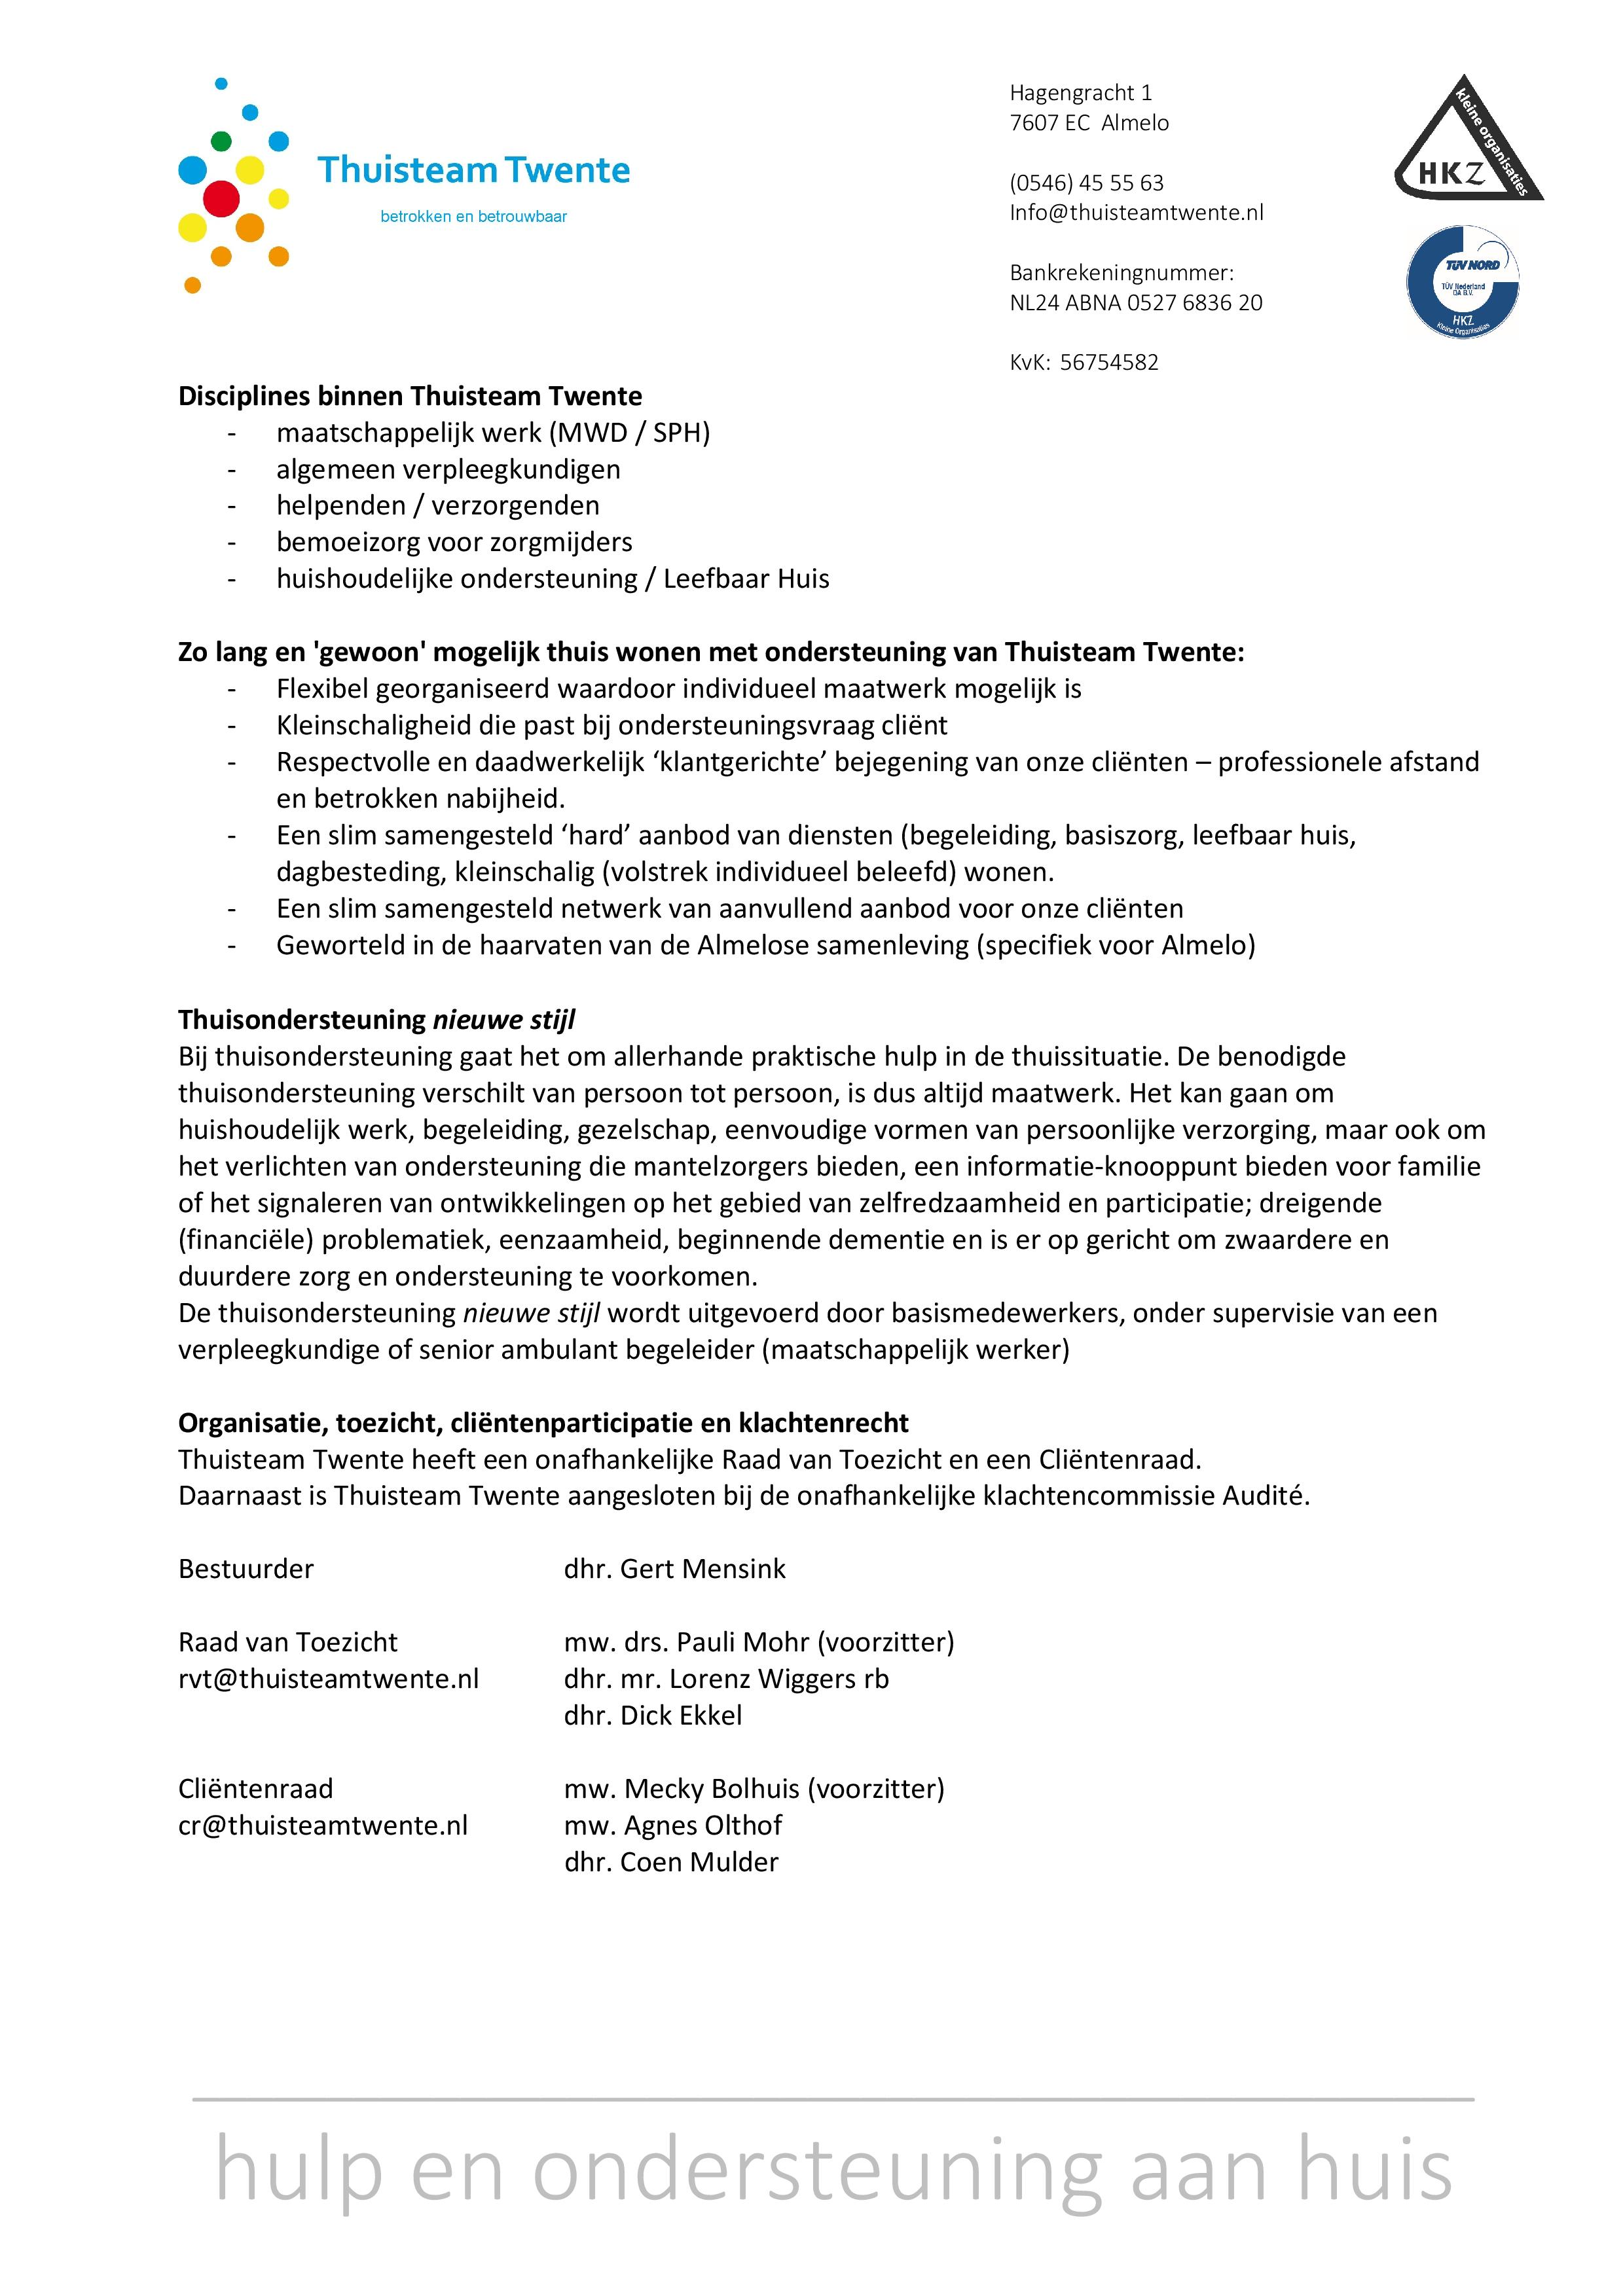 160000-algemene-informatie-over-ttt-beschermd-thuis-page-002